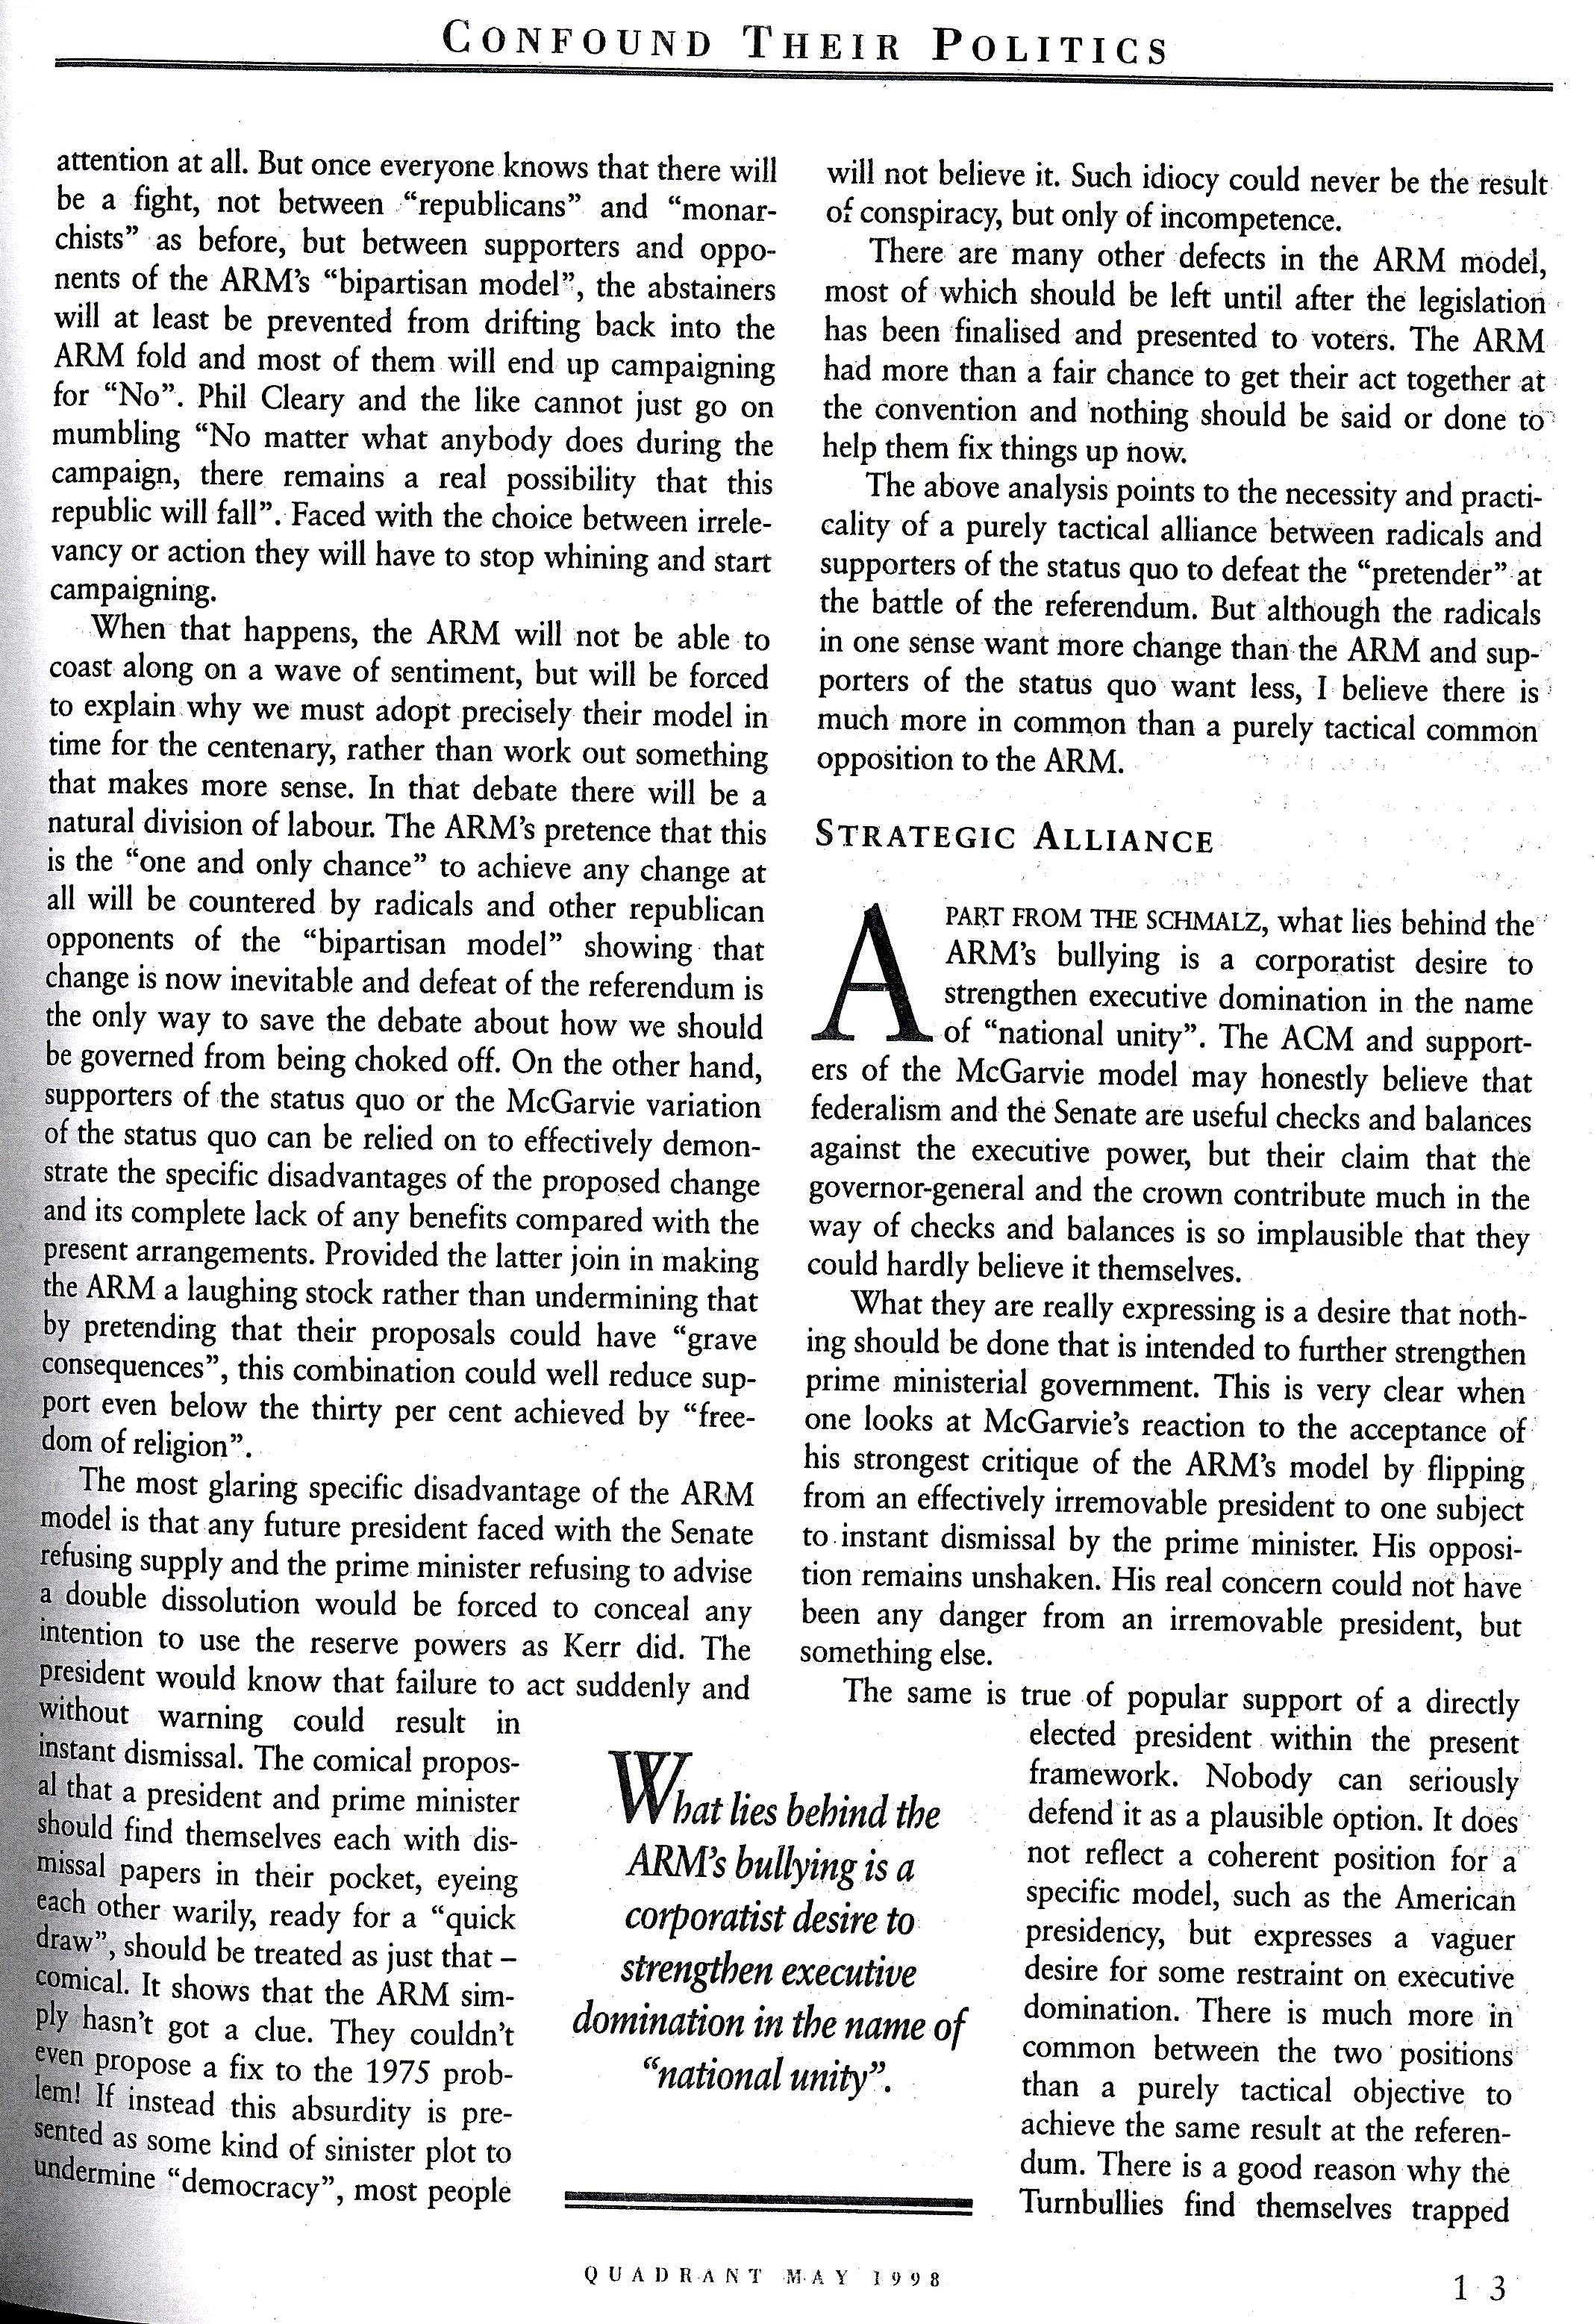 Albert Langer Confound their politics Quadrant May 1998_4